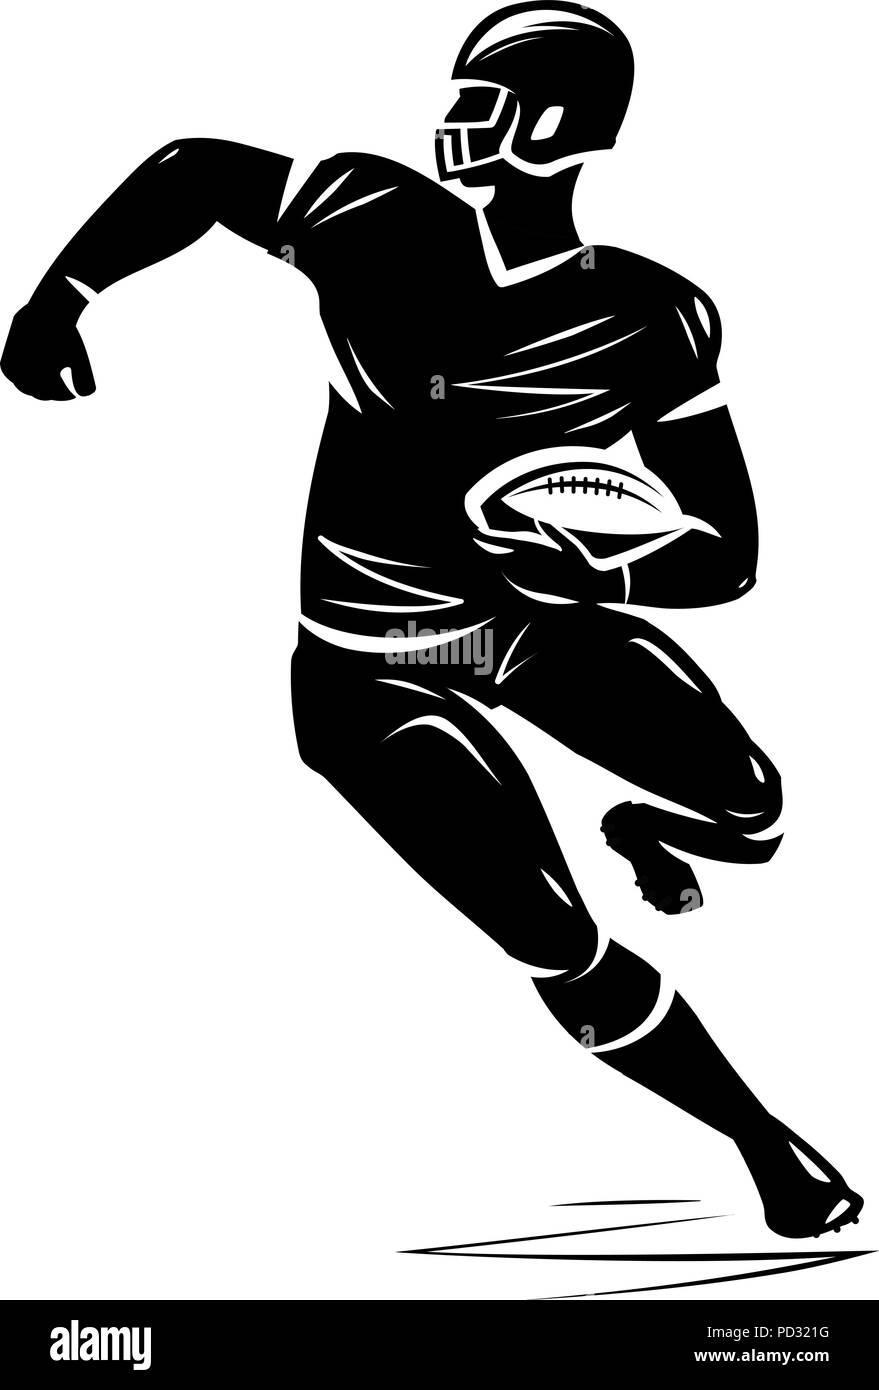 Football player, silhouette. Vector illustration - Stock Vector